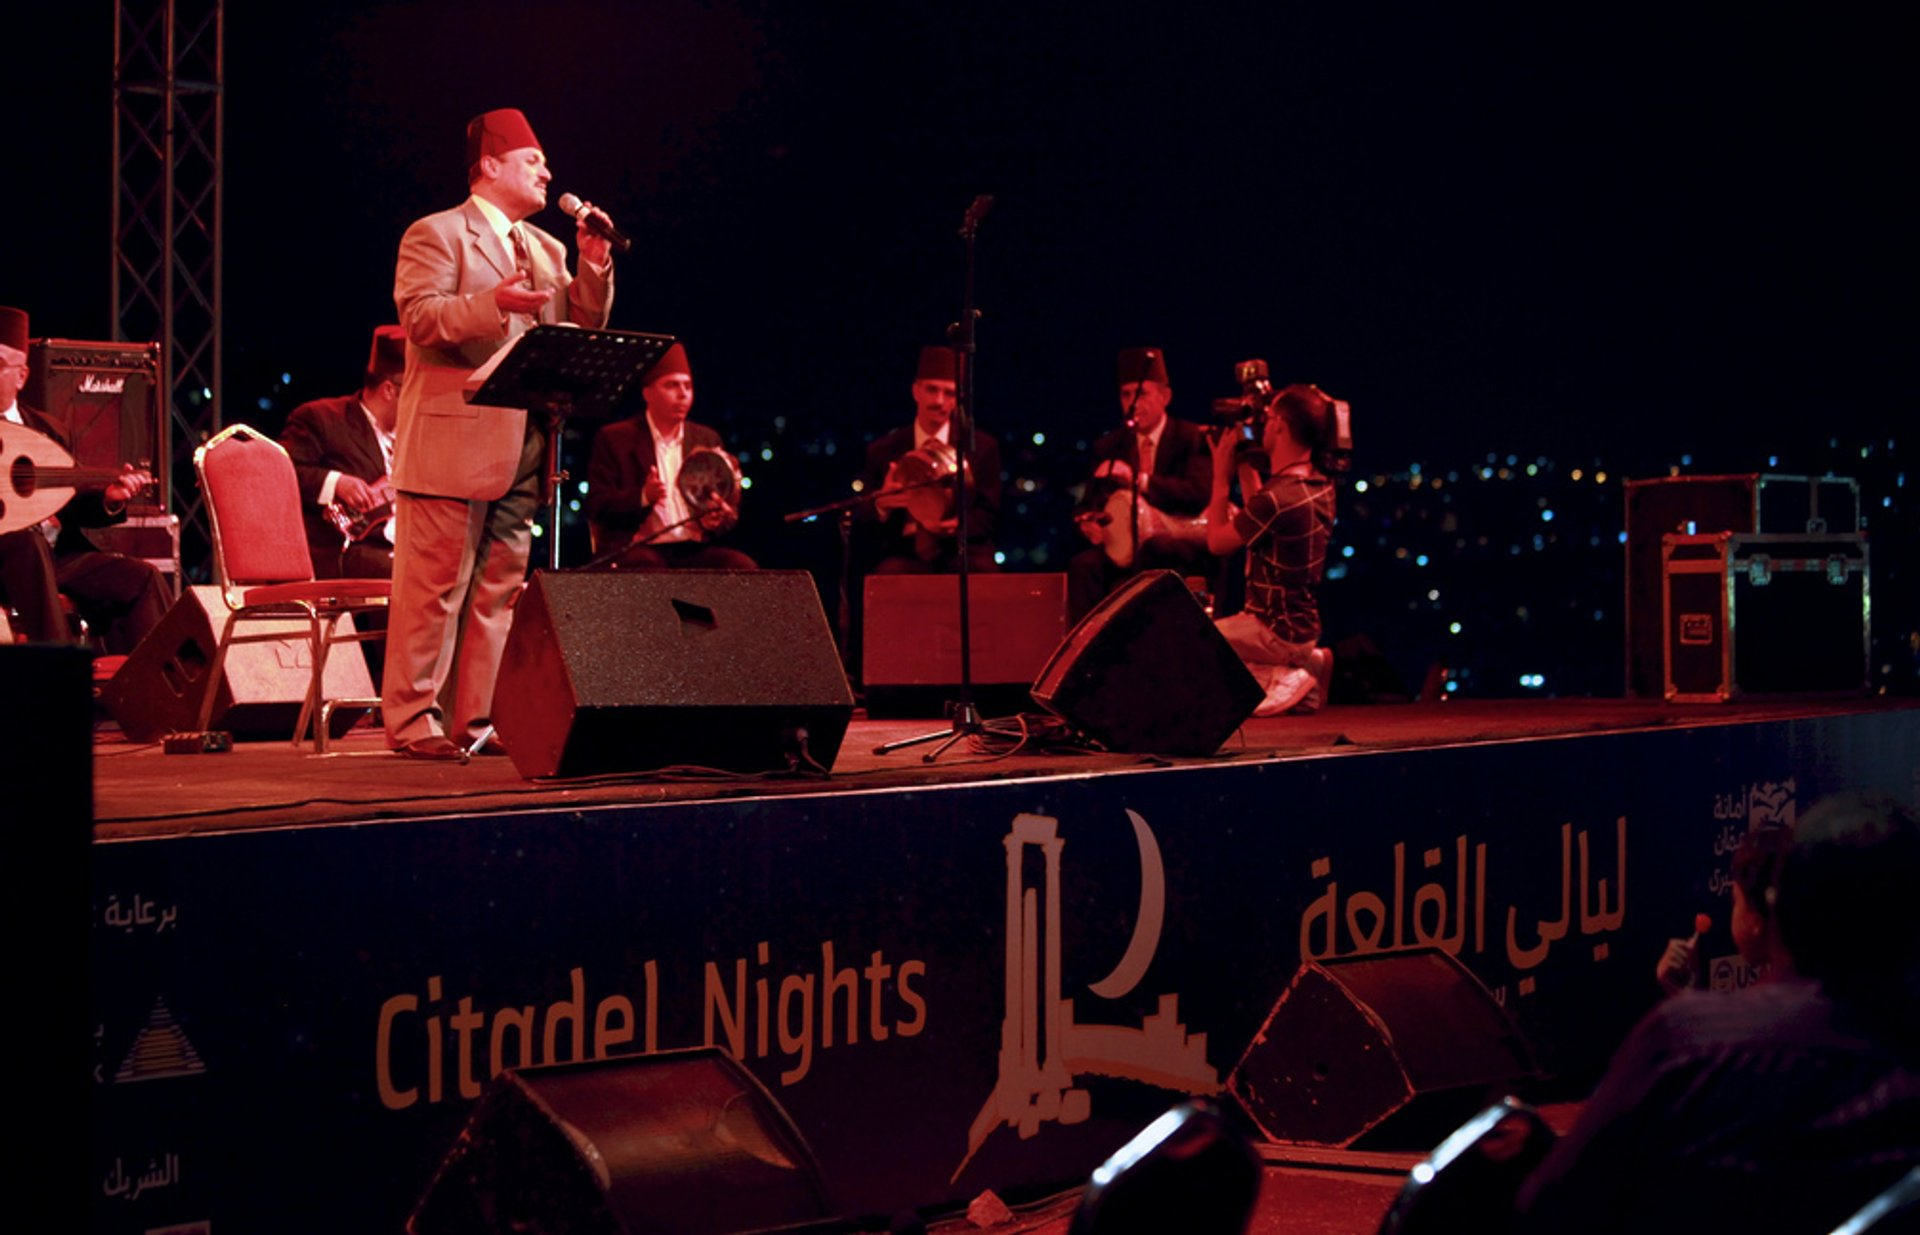 Citadel Nights in Jordan 2019 - Best Time